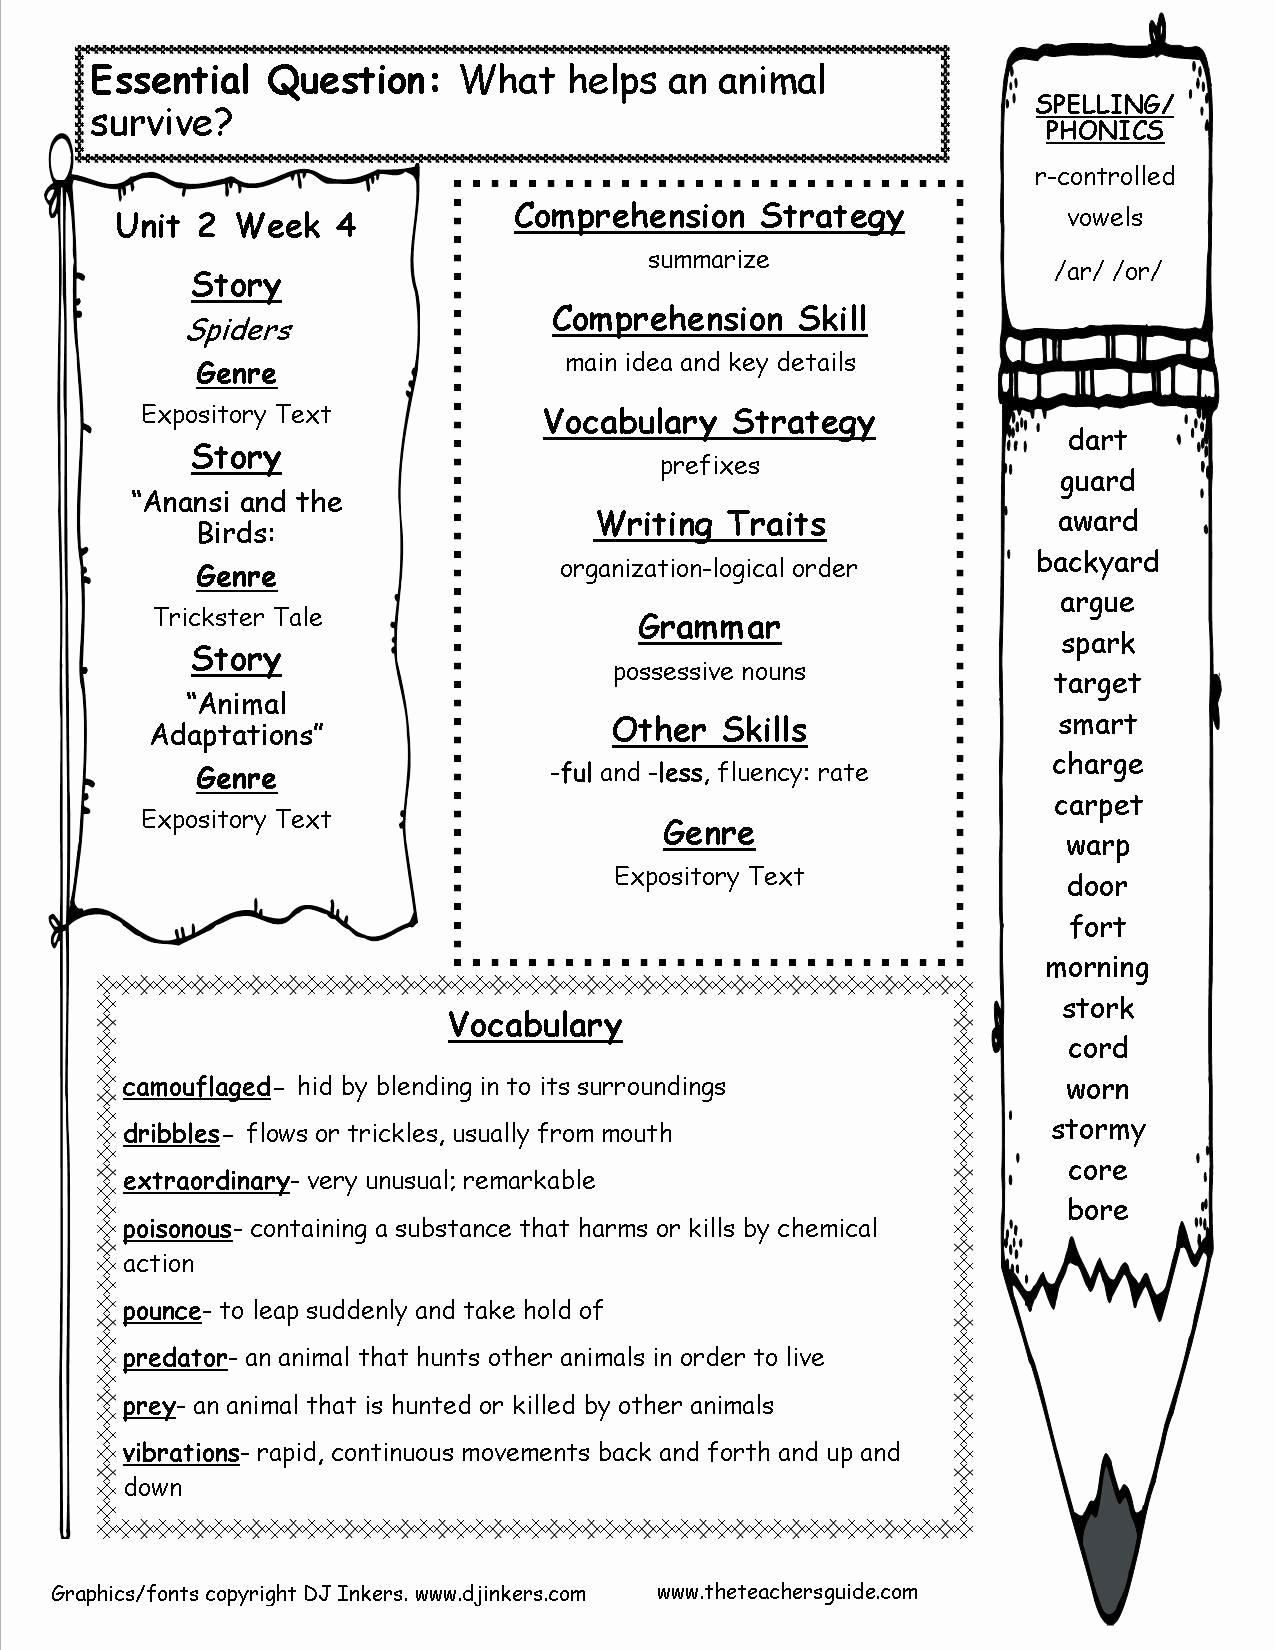 Summarizing Worksheet 3rd Grade Elegant 20 Summarizing Worksheets 3rd Grade